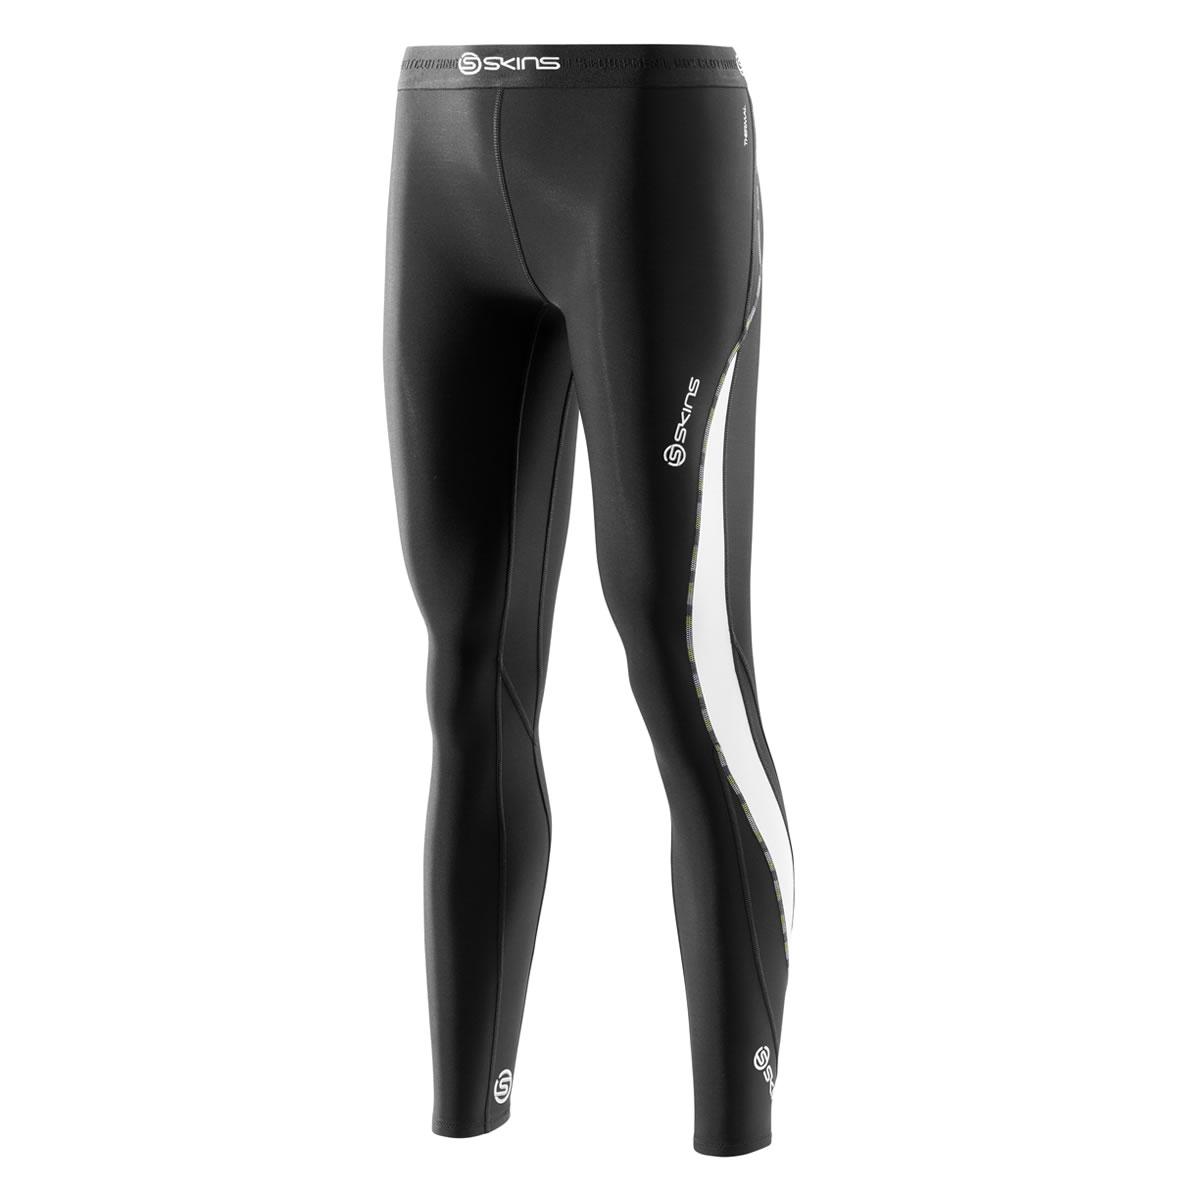 0166f333fa37 DT00020010006-dnamic-thermal-long-tights-women-skins-black-cloud.jpg